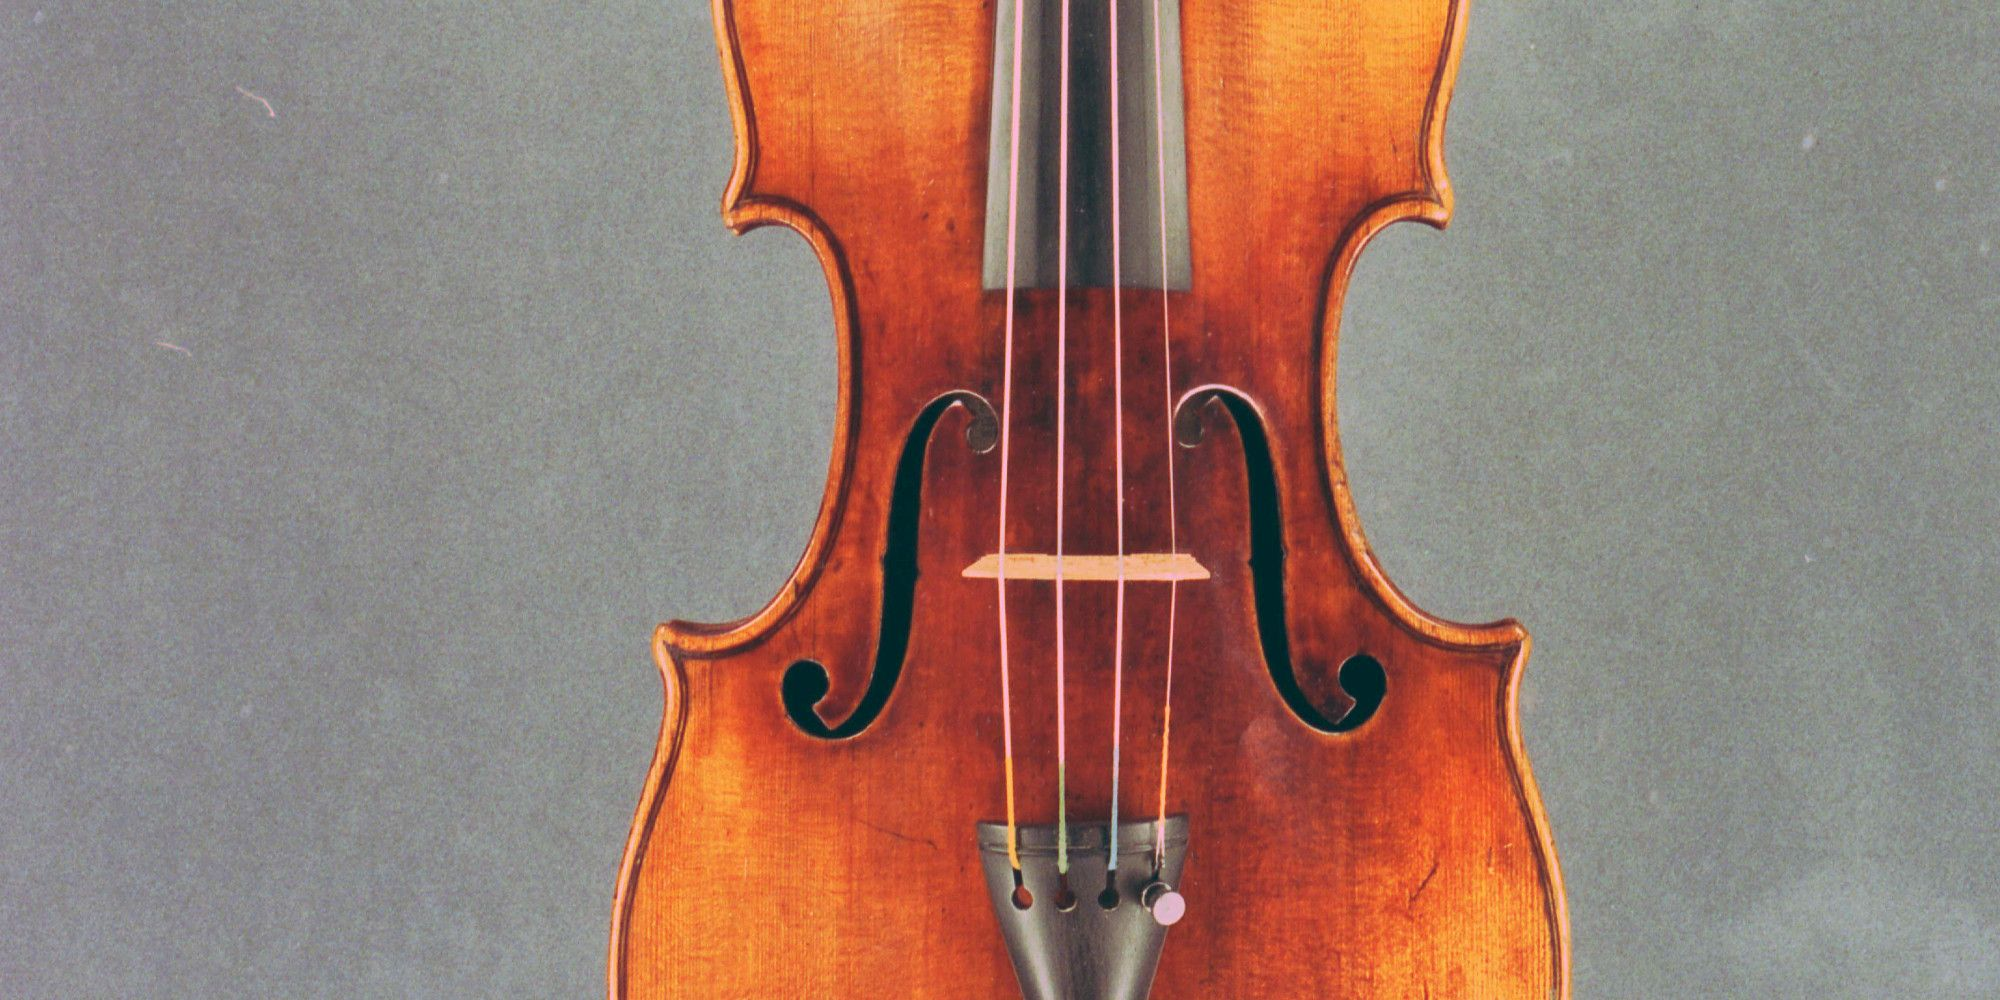 300 Year Old Stradivarius Violin Stolen From Milwaukee Symphony Stradivarius Violin Violin Stradivarius